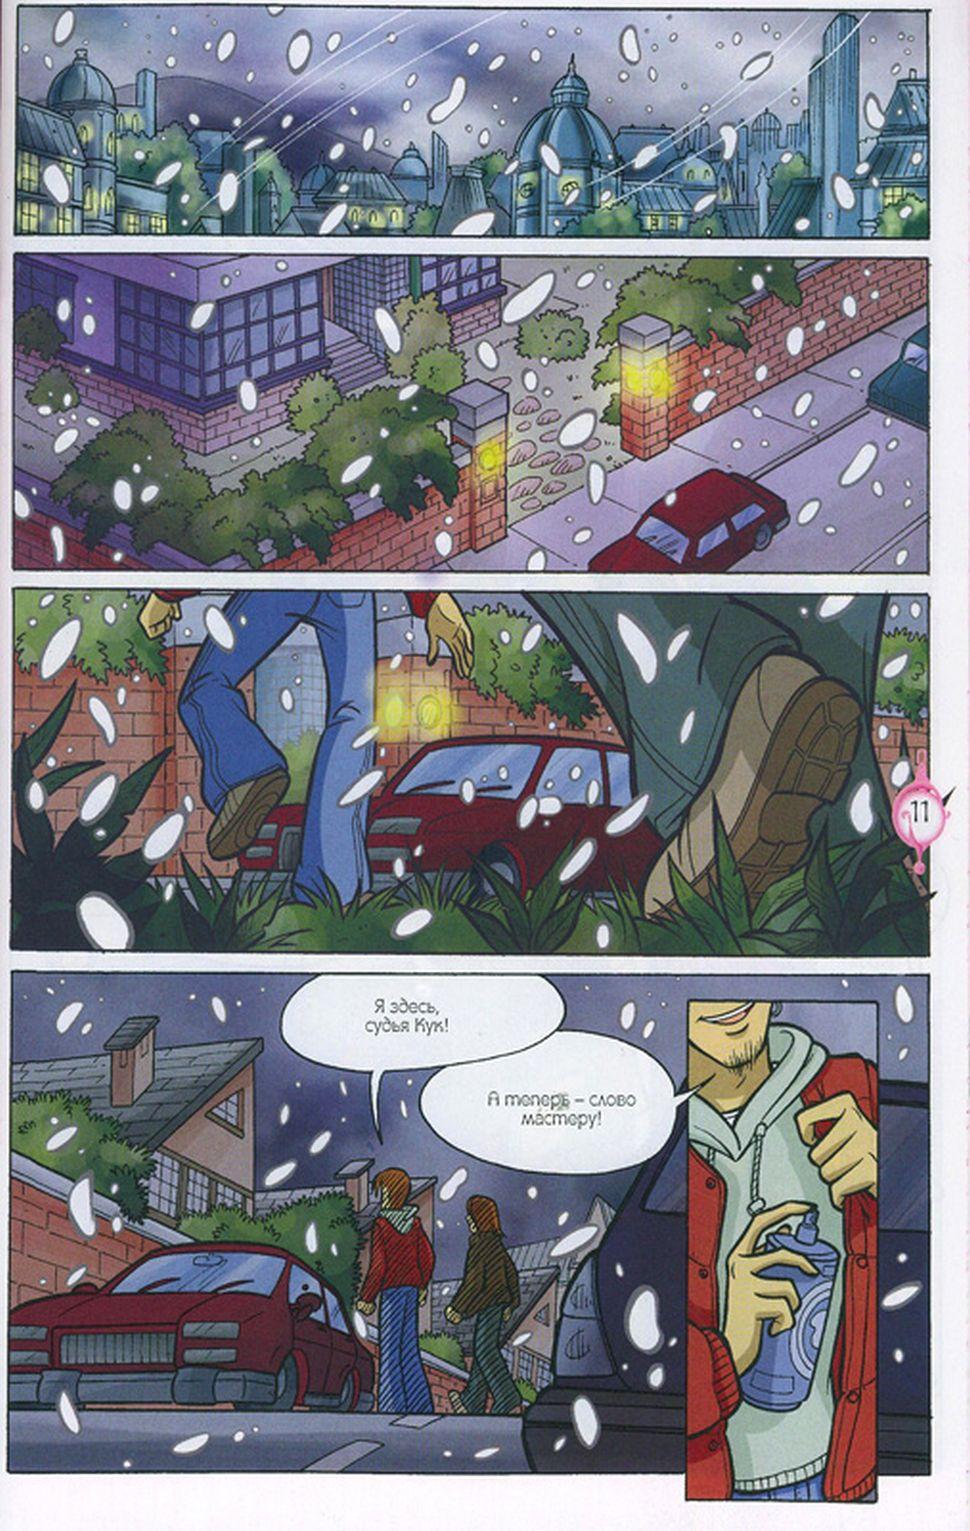 WITСH.Чародейки - Запах свободы. 3 сезон 34 серия